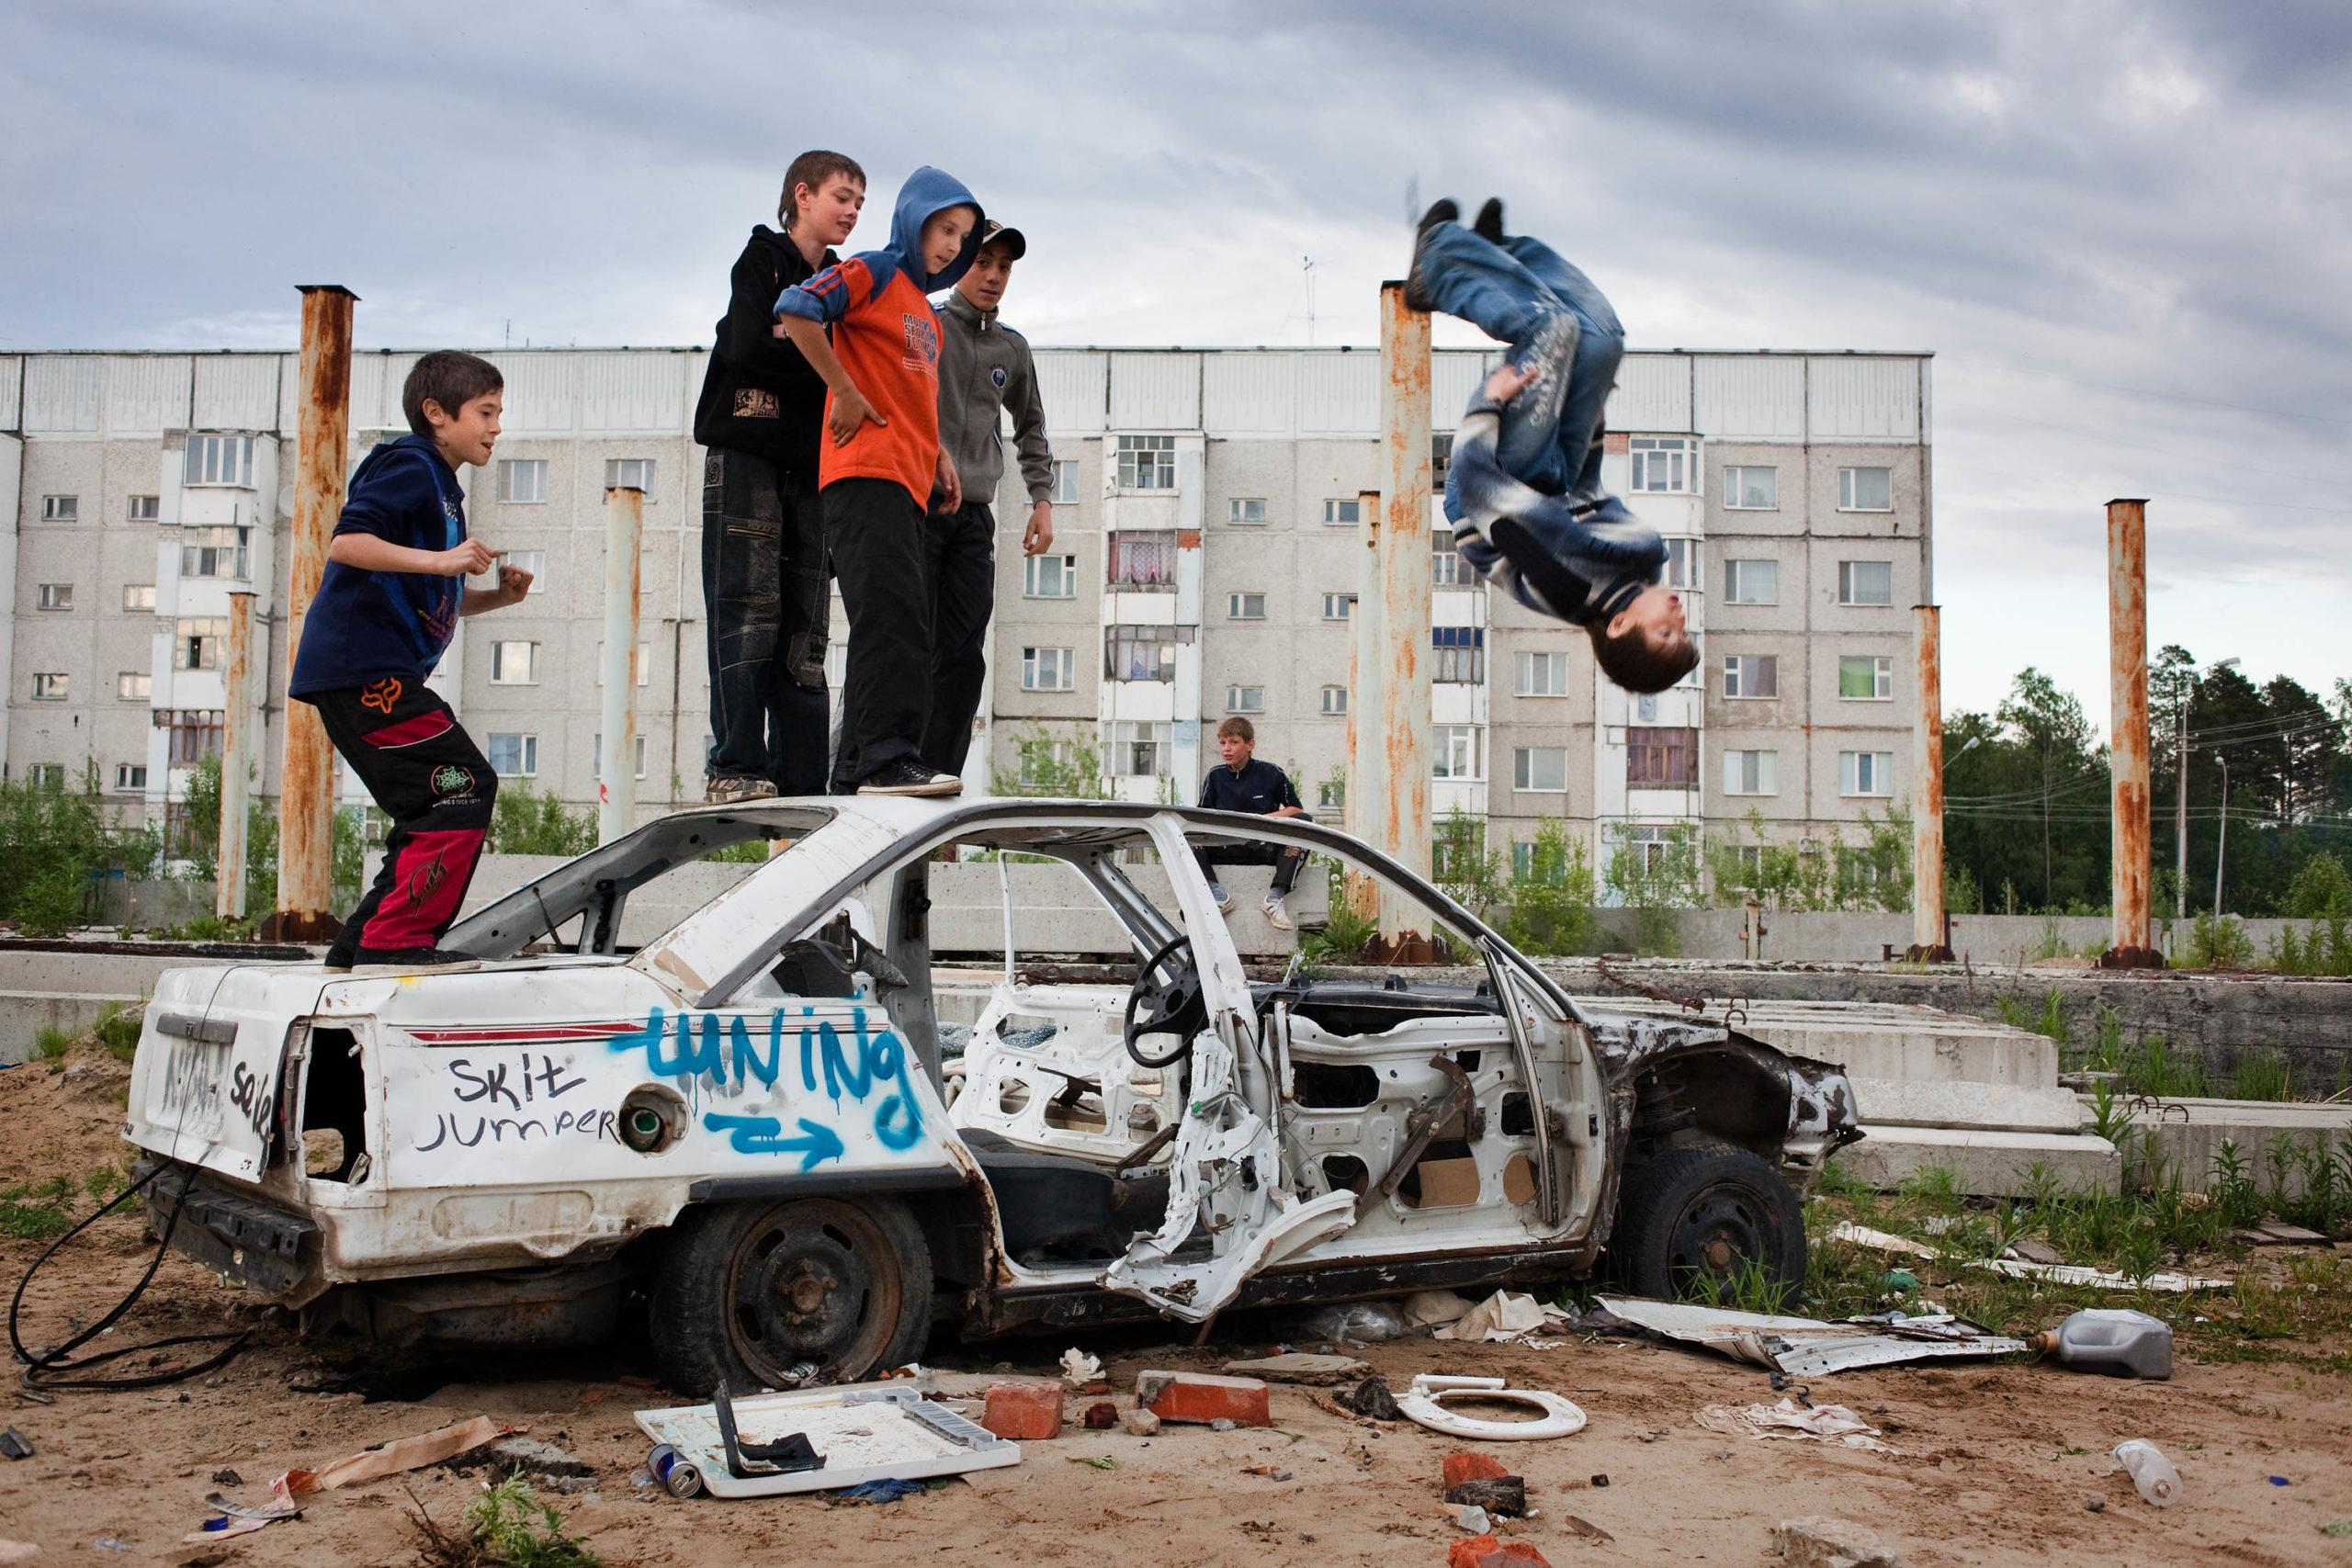 Opel #2. Surgut, Siberia, 2009